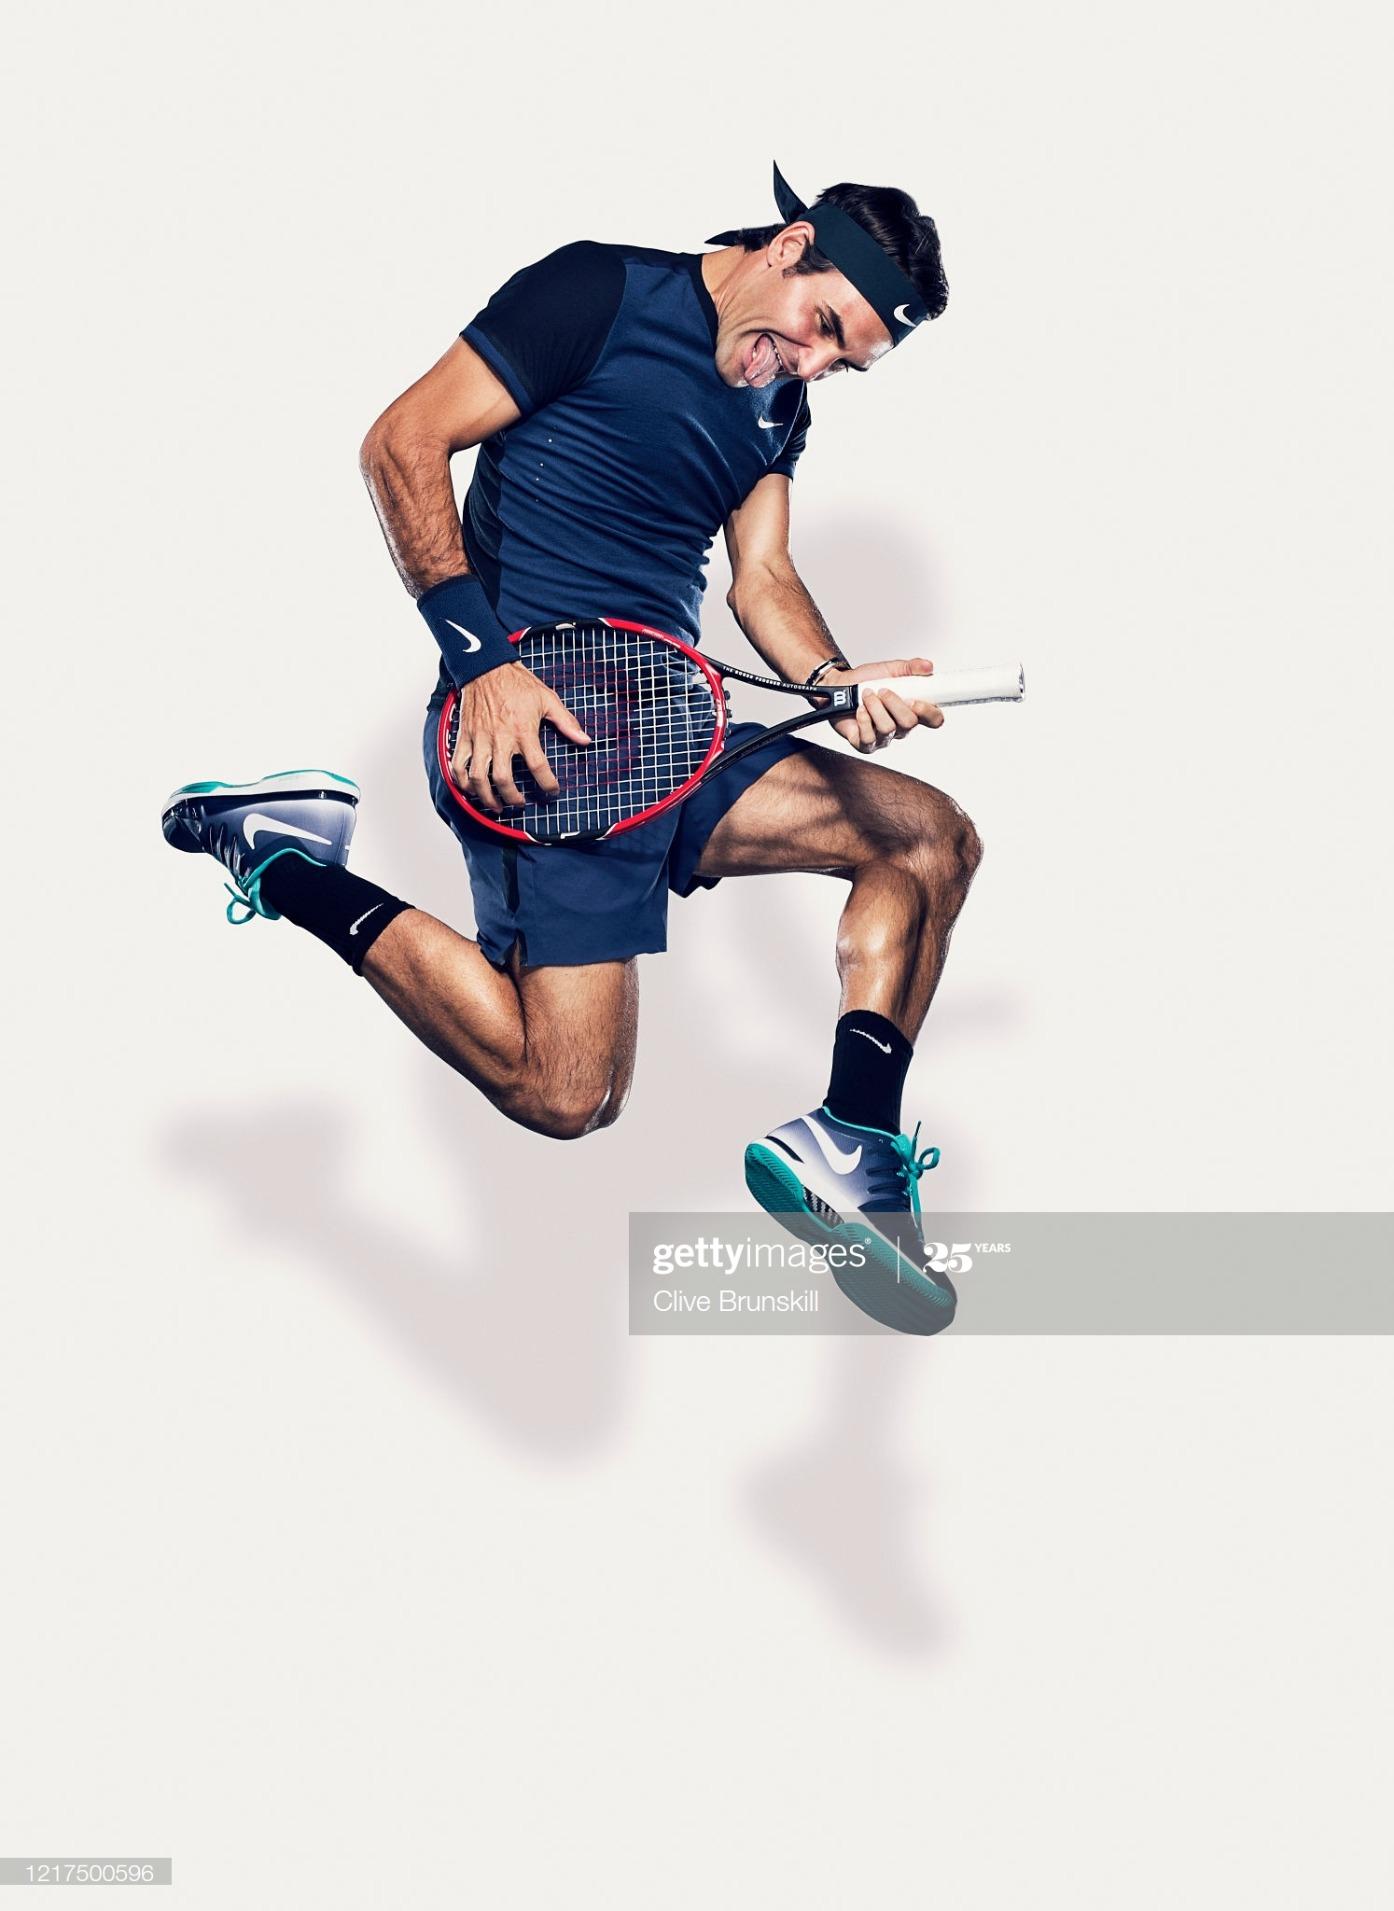 Roger Federer, Portrait shoot, March 12, 2015 : News Photo